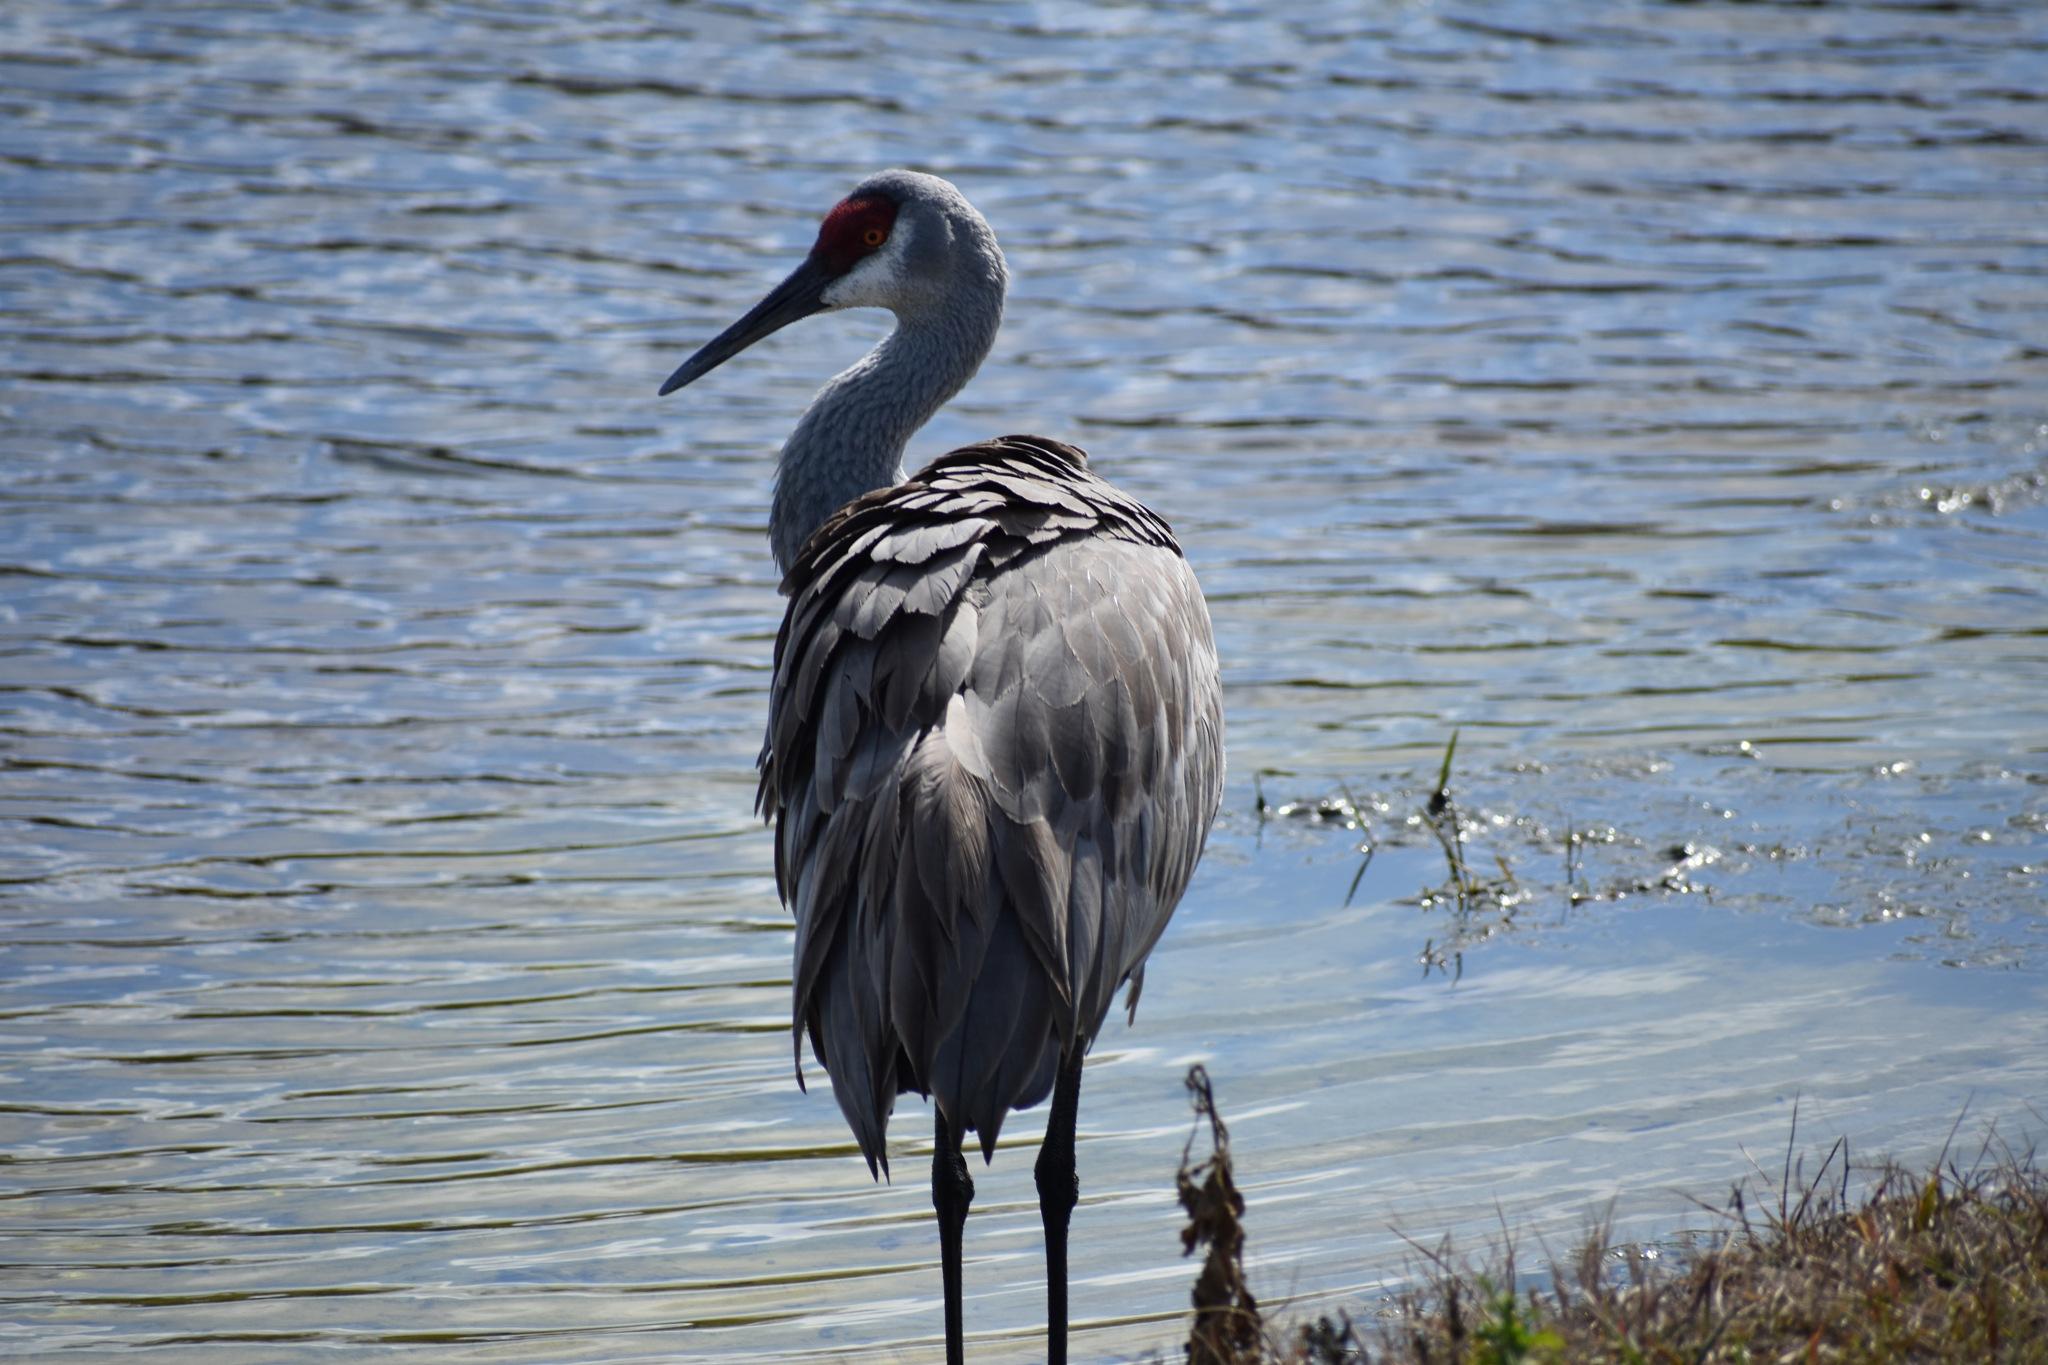 Pond Heron by Gabriel Rolon